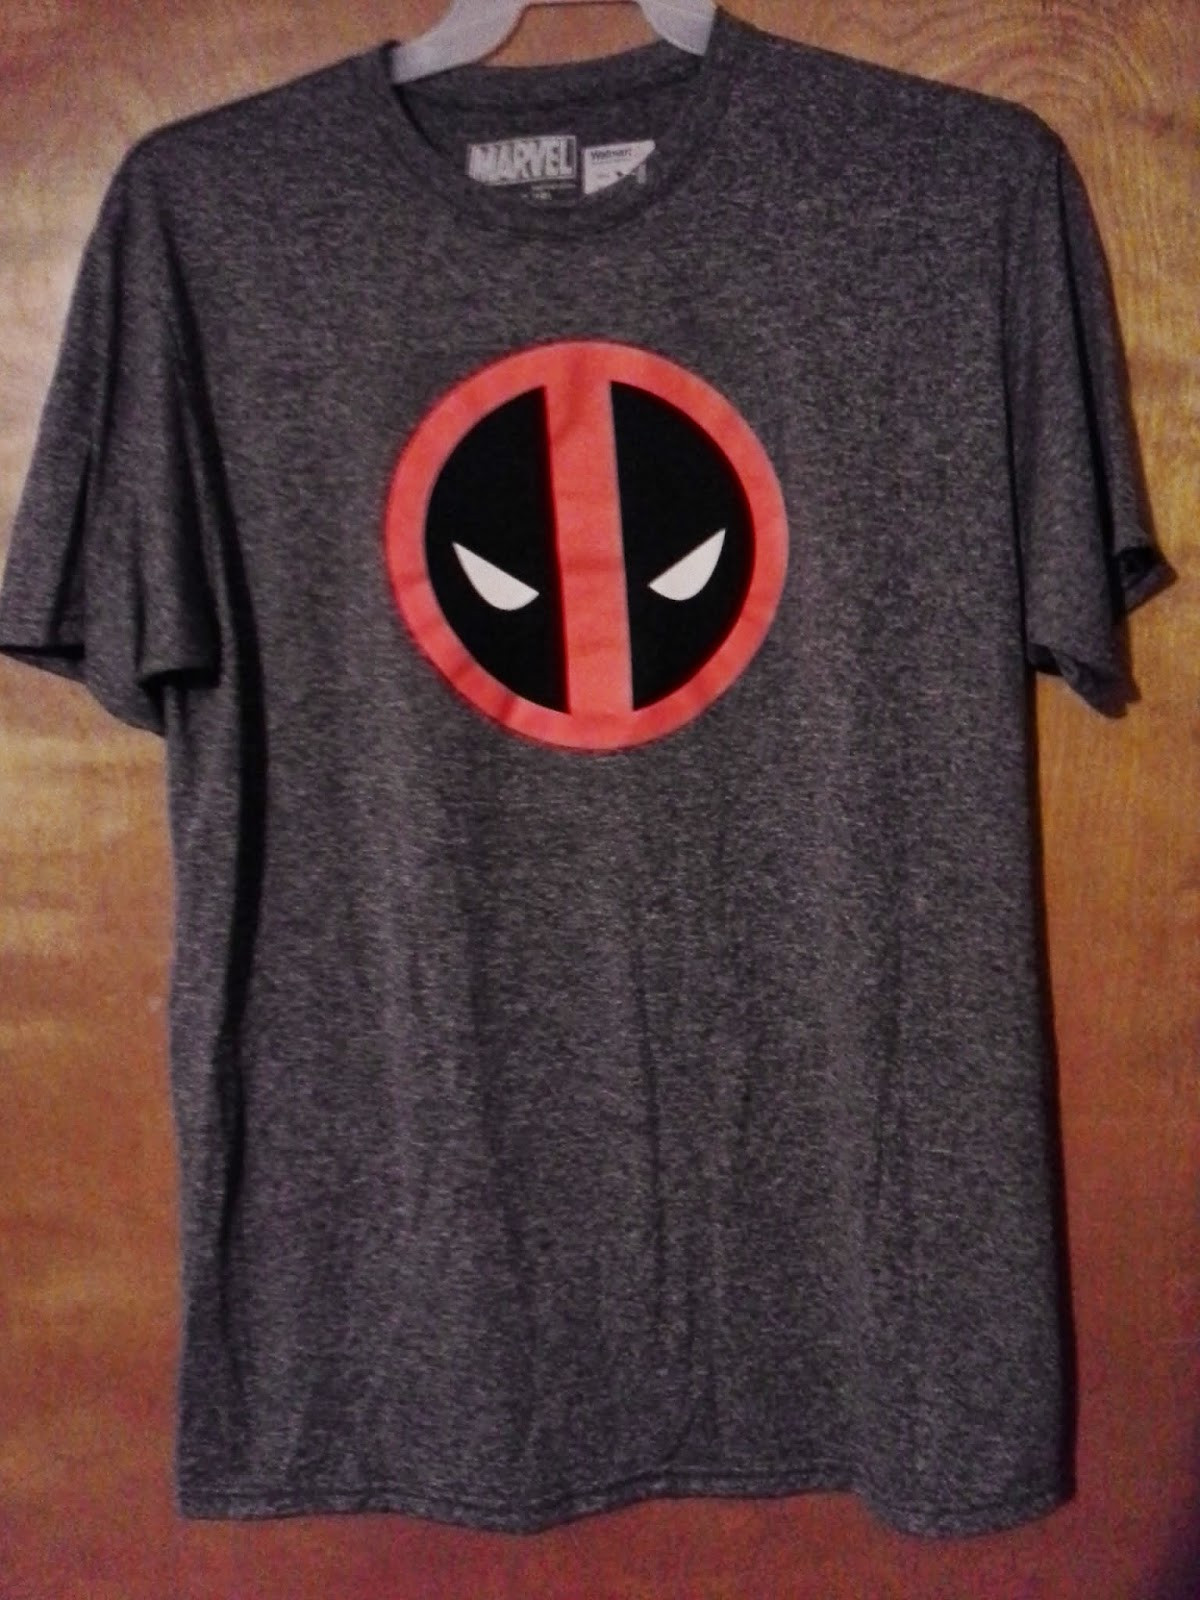 Black t shirt at walmart - Black T Shirt At Walmart 8